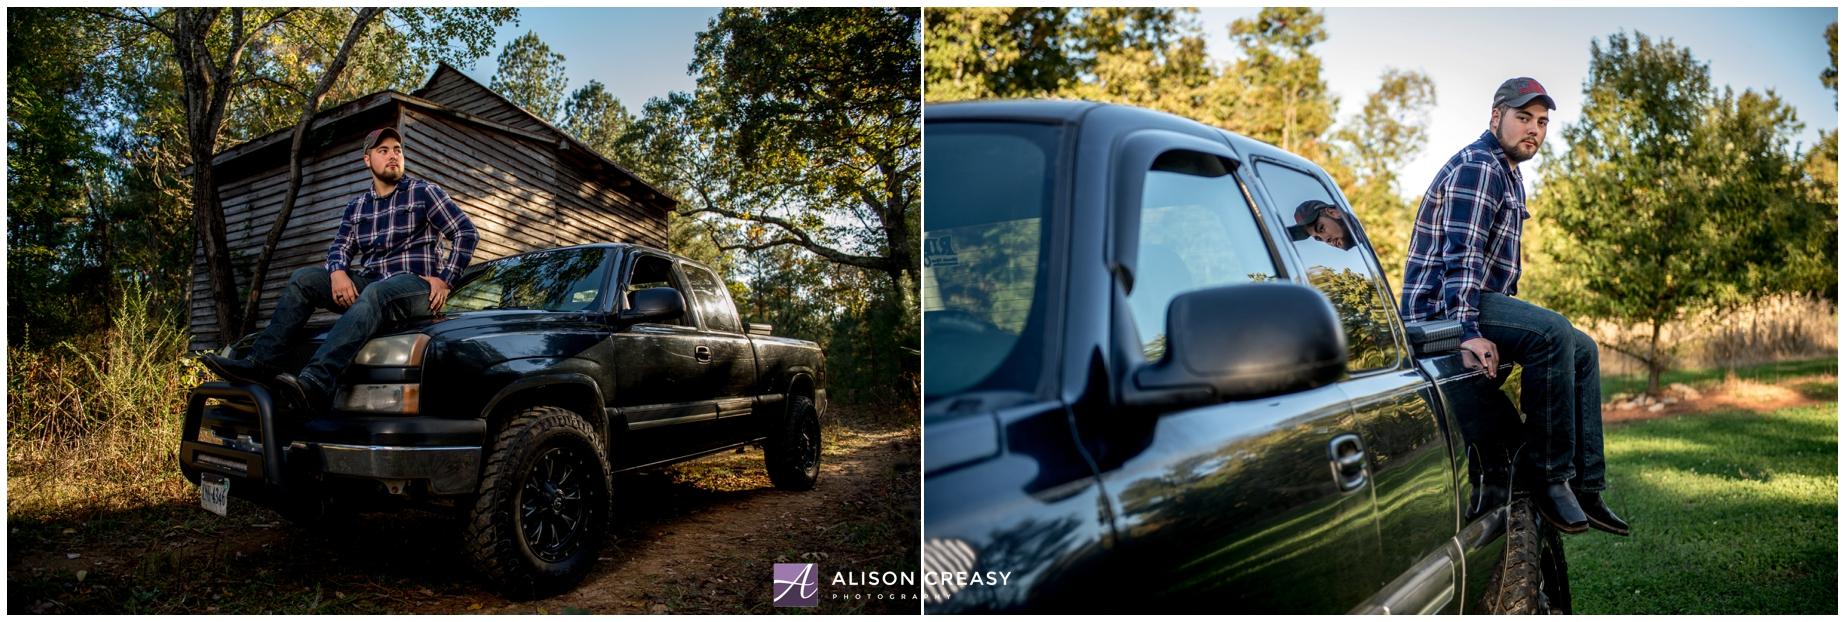 Alison-Creasy-Photography-Lynchburg-VA-Photographer_1005.jpg